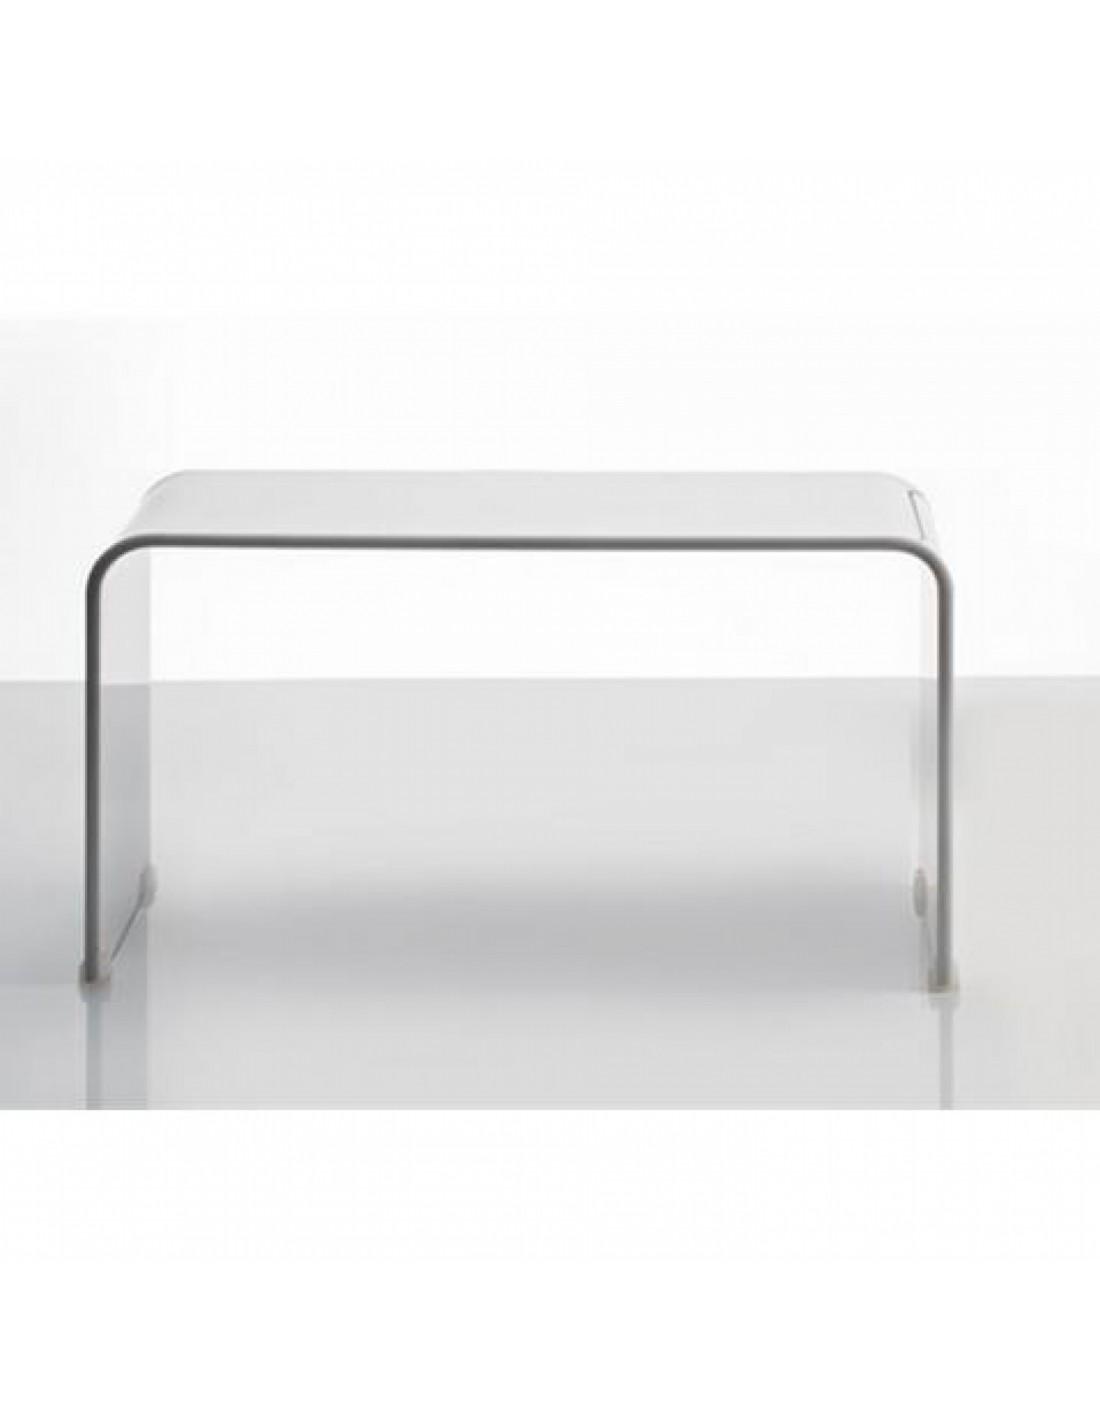 banc bain decor walther blanc en acrylique. Black Bedroom Furniture Sets. Home Design Ideas